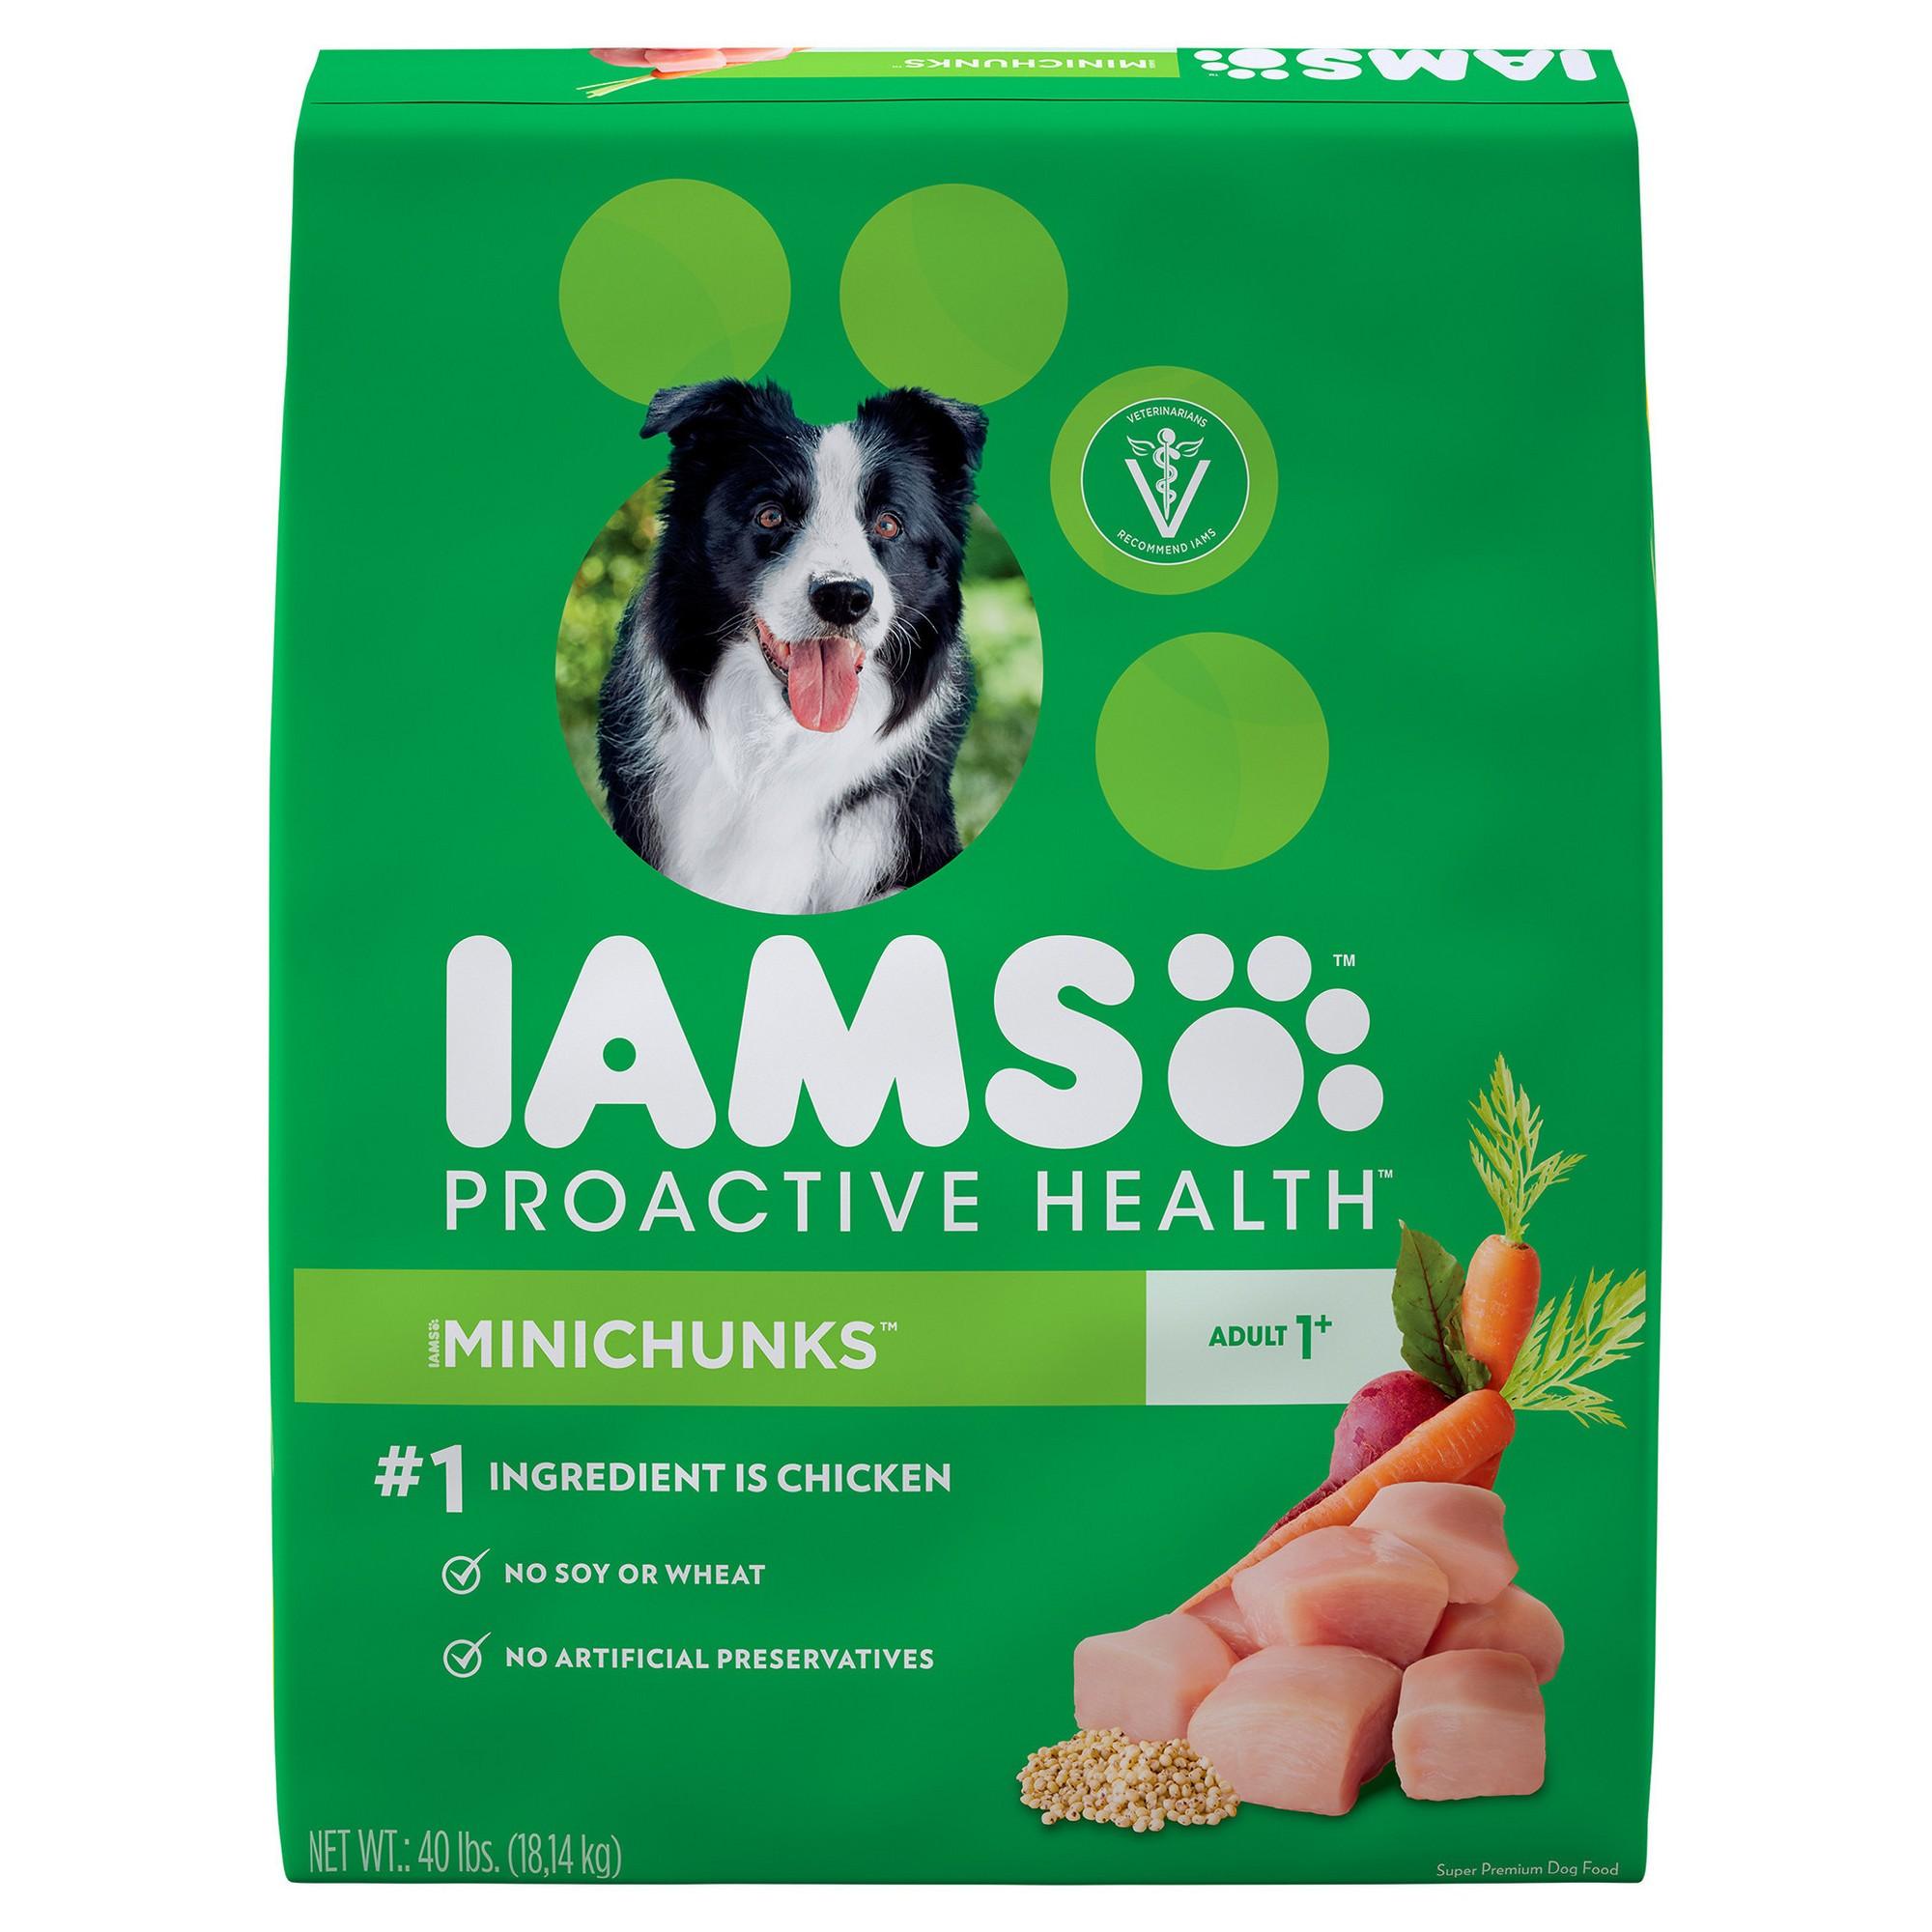 Iams Proactive Health Adult Minichunks Chicken Flavor Dry Dog Food